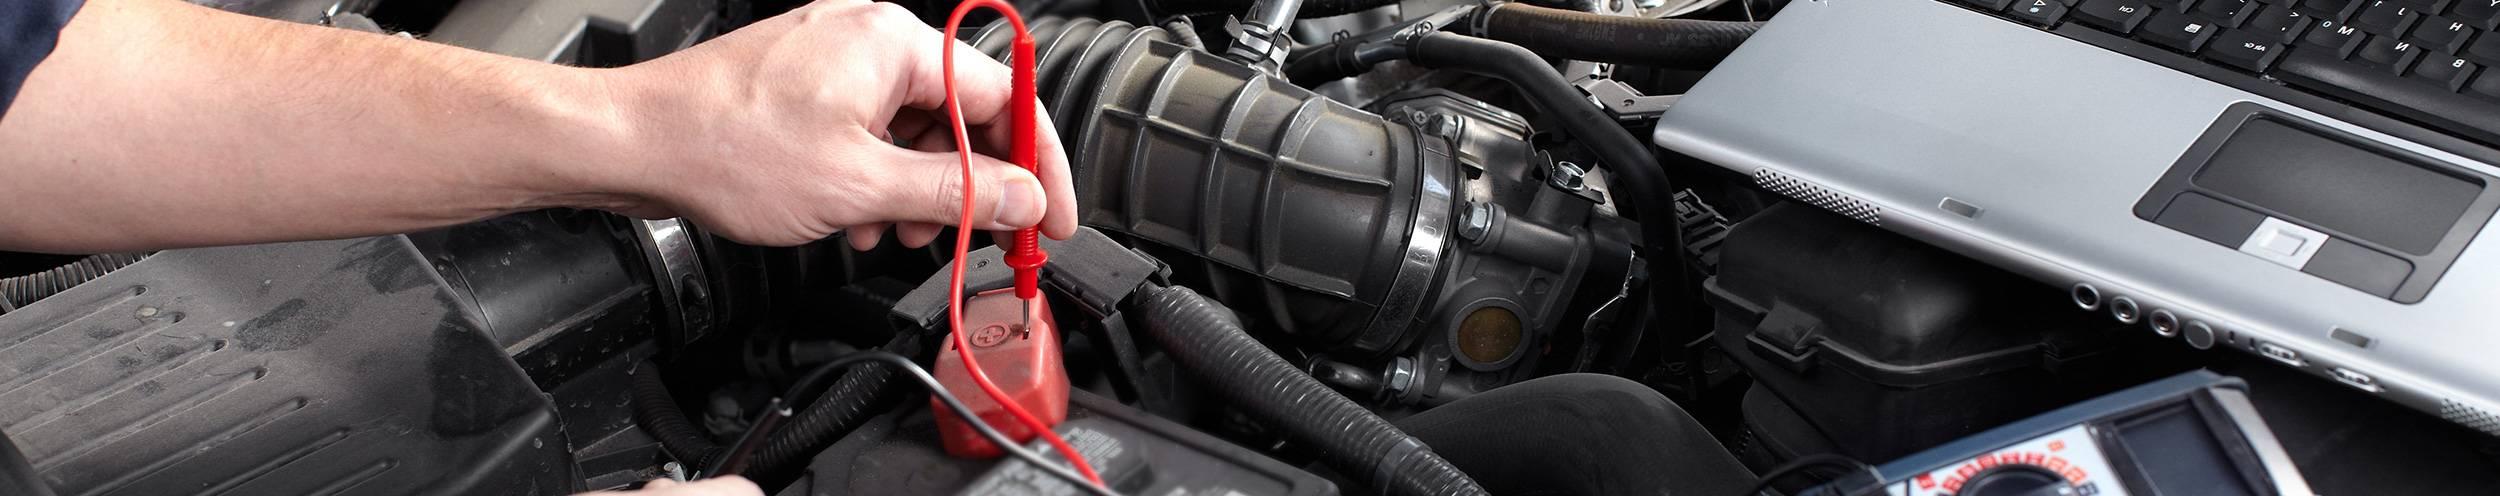 mechanic performing car engine diagnostics with laptop